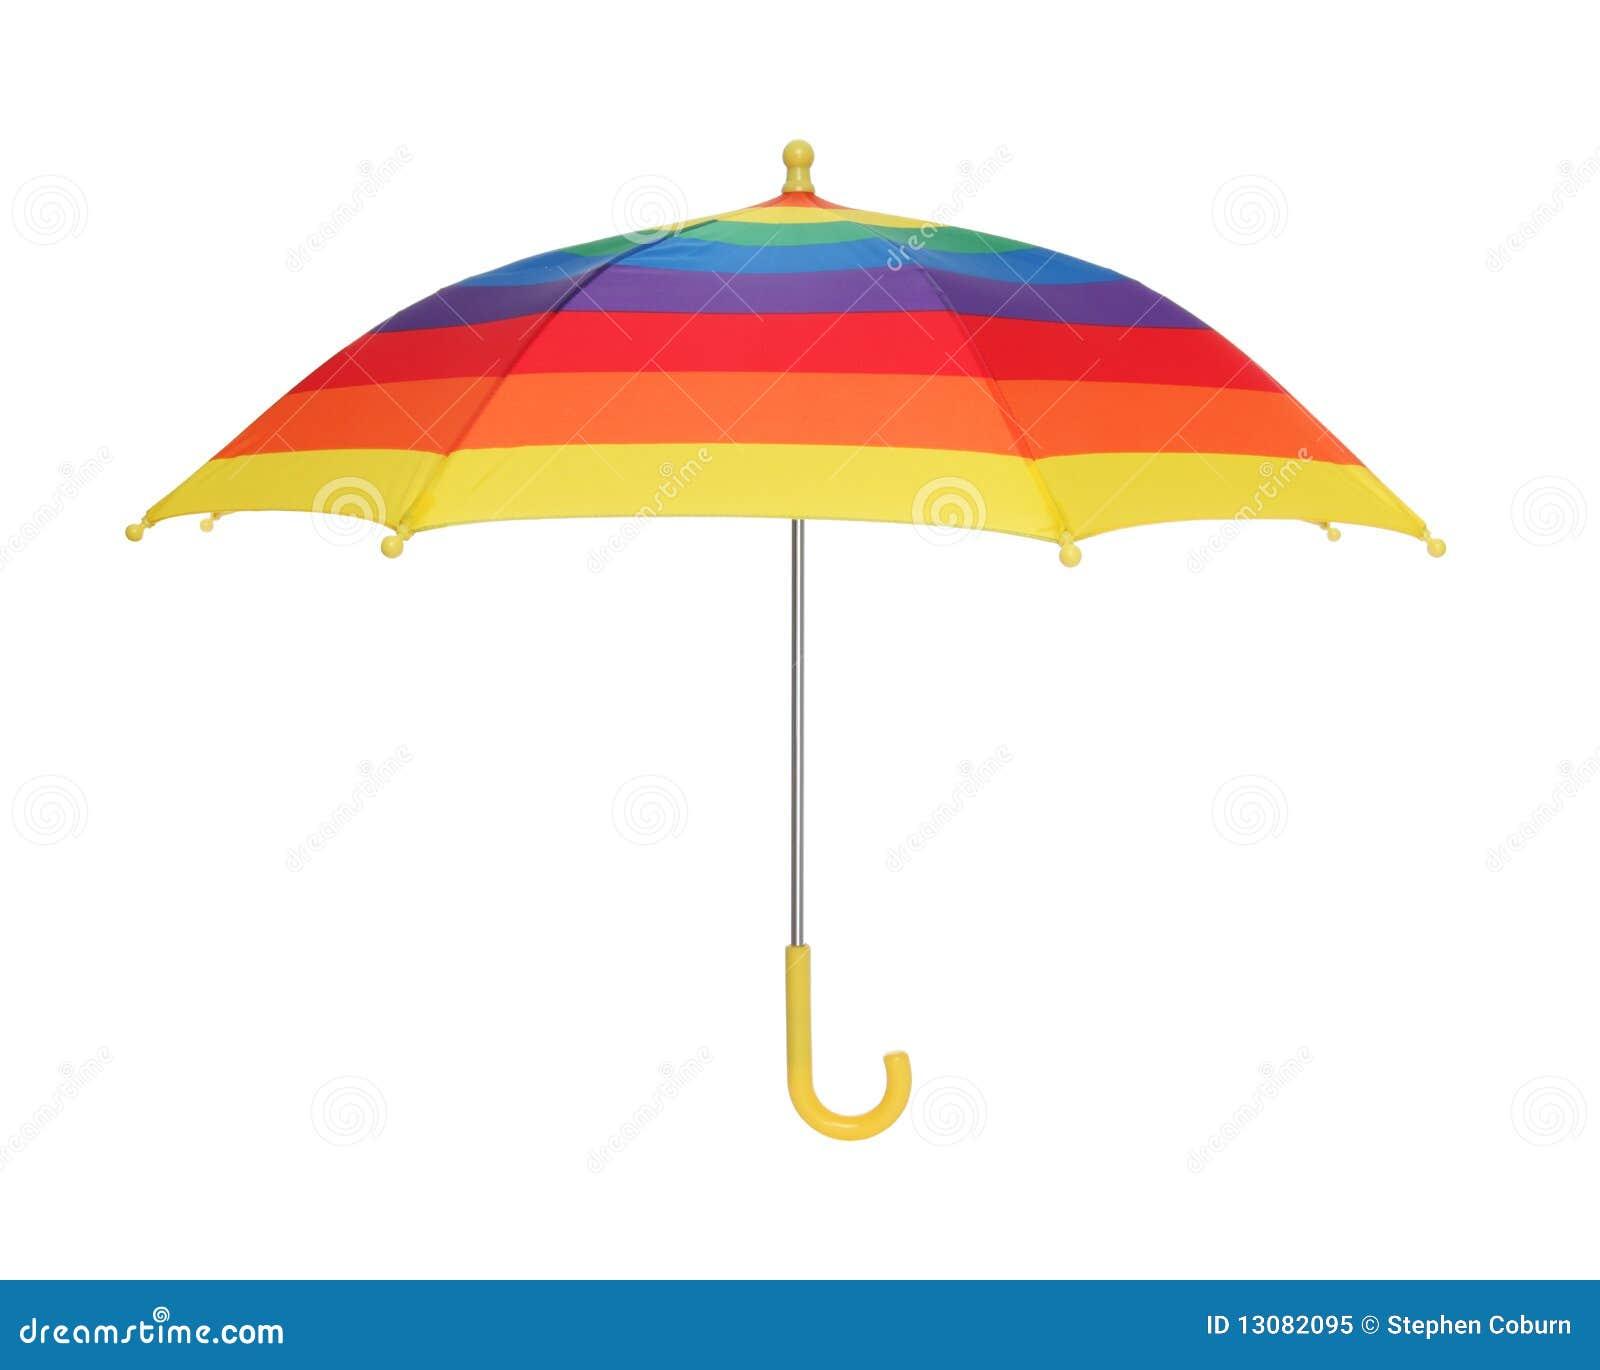 rainbow umbrella clip art - photo #40